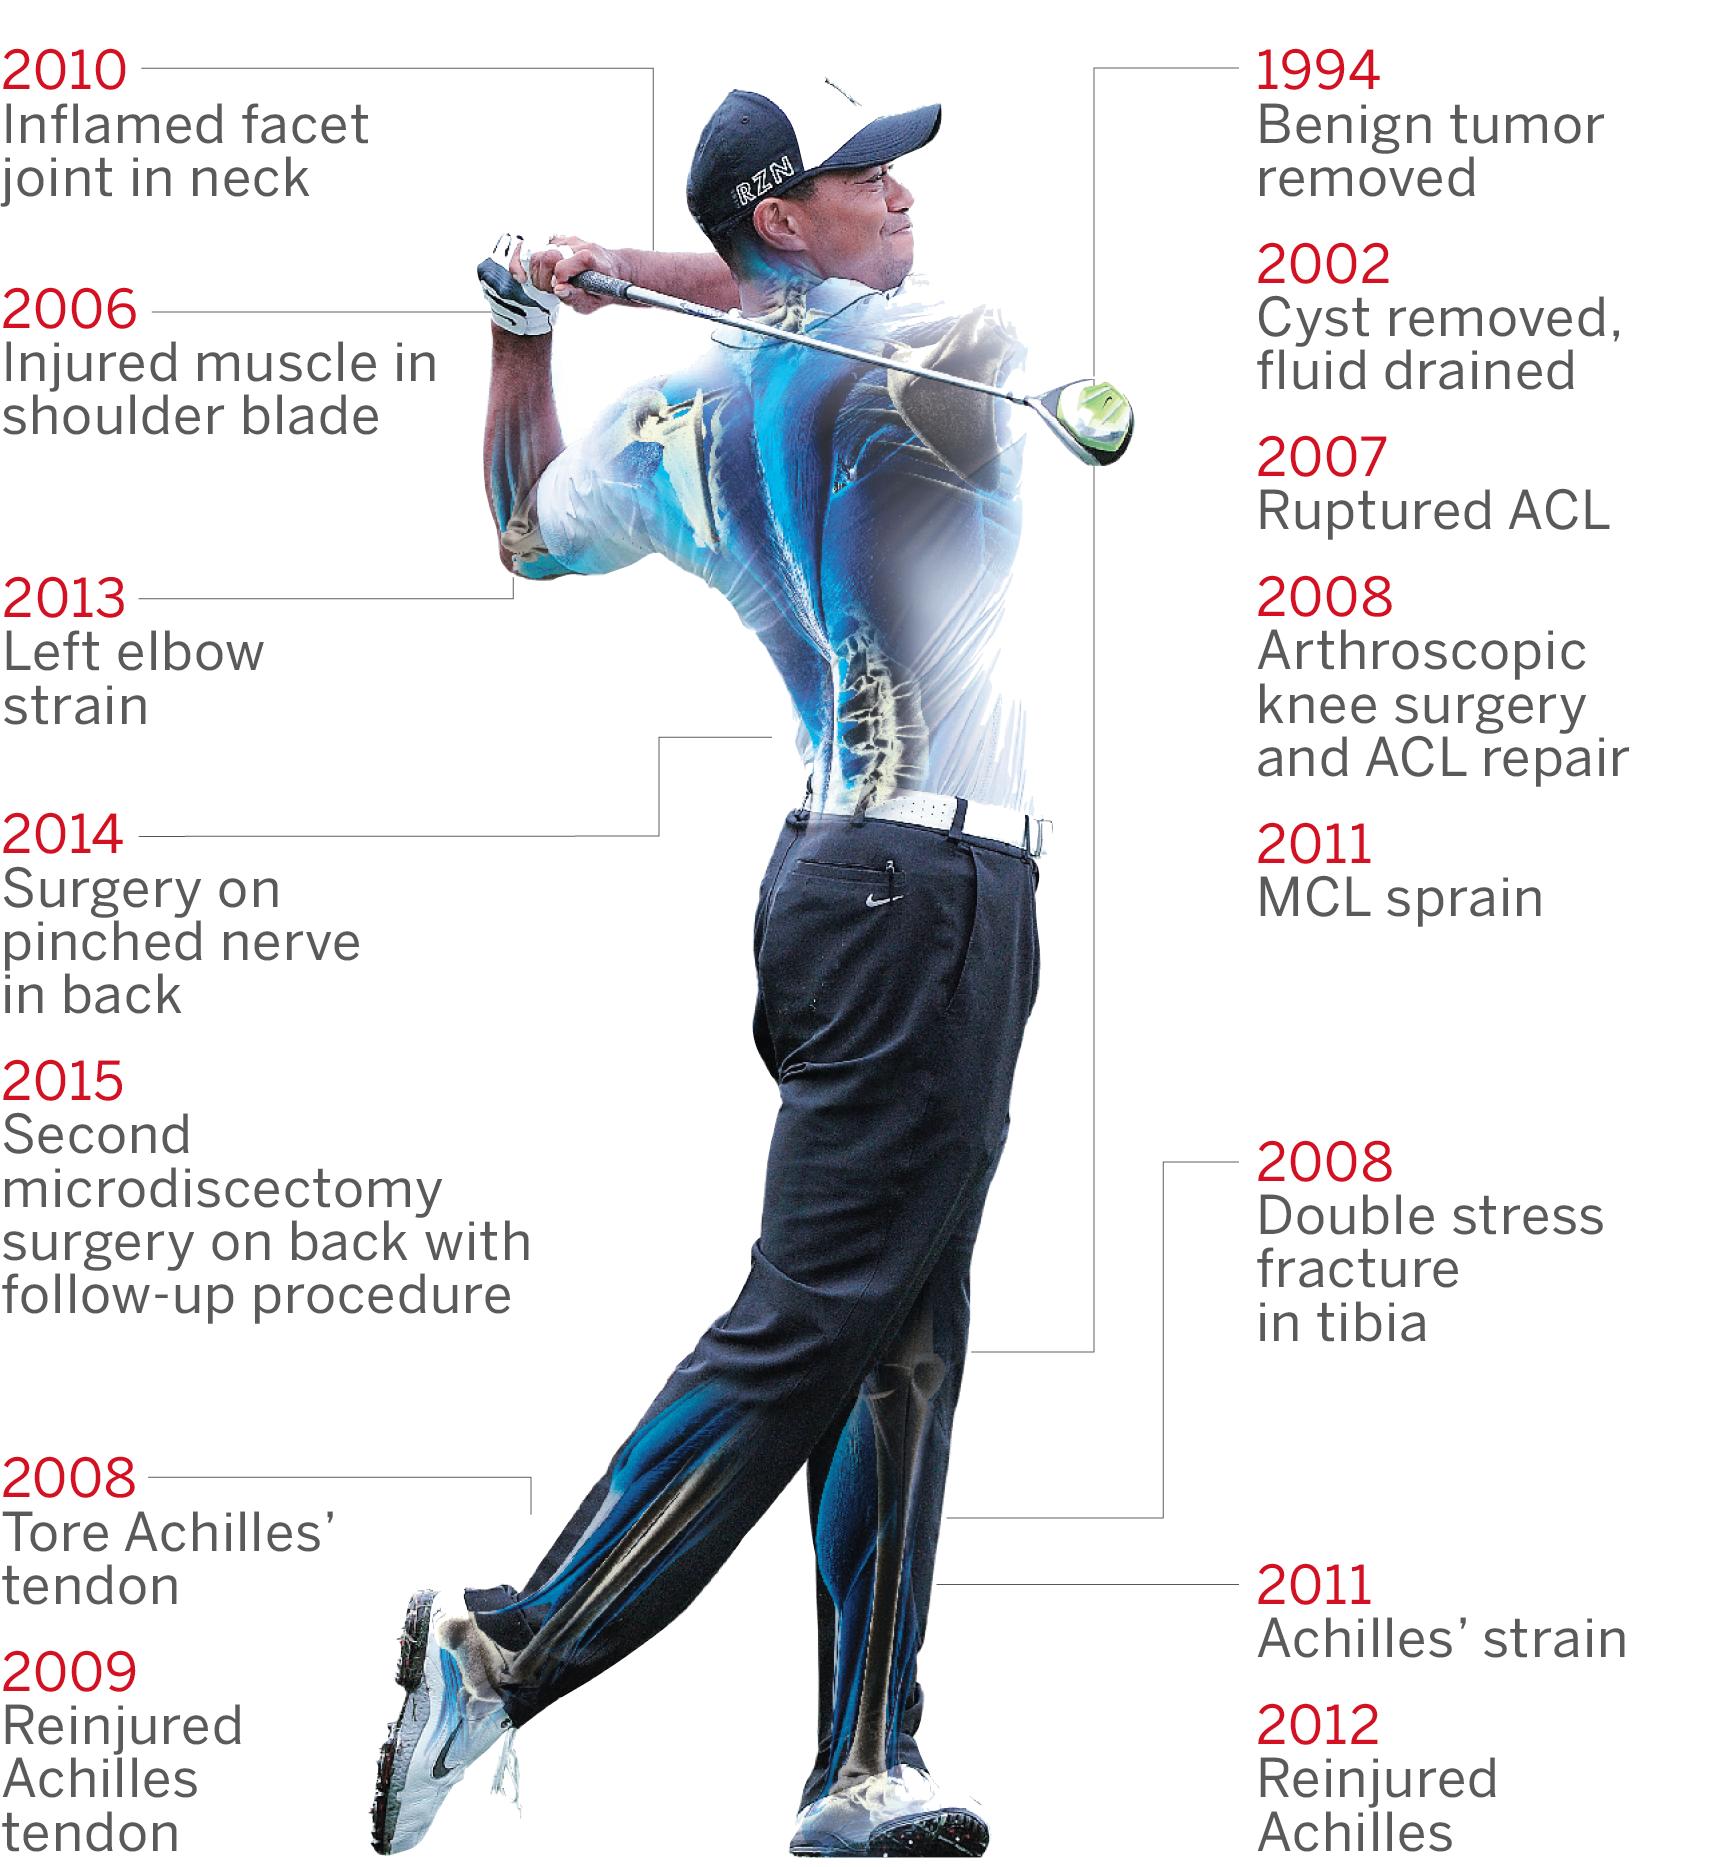 Image credit: https://abcnews.go.com   ABC News   Tiger Woods Injury Timeline